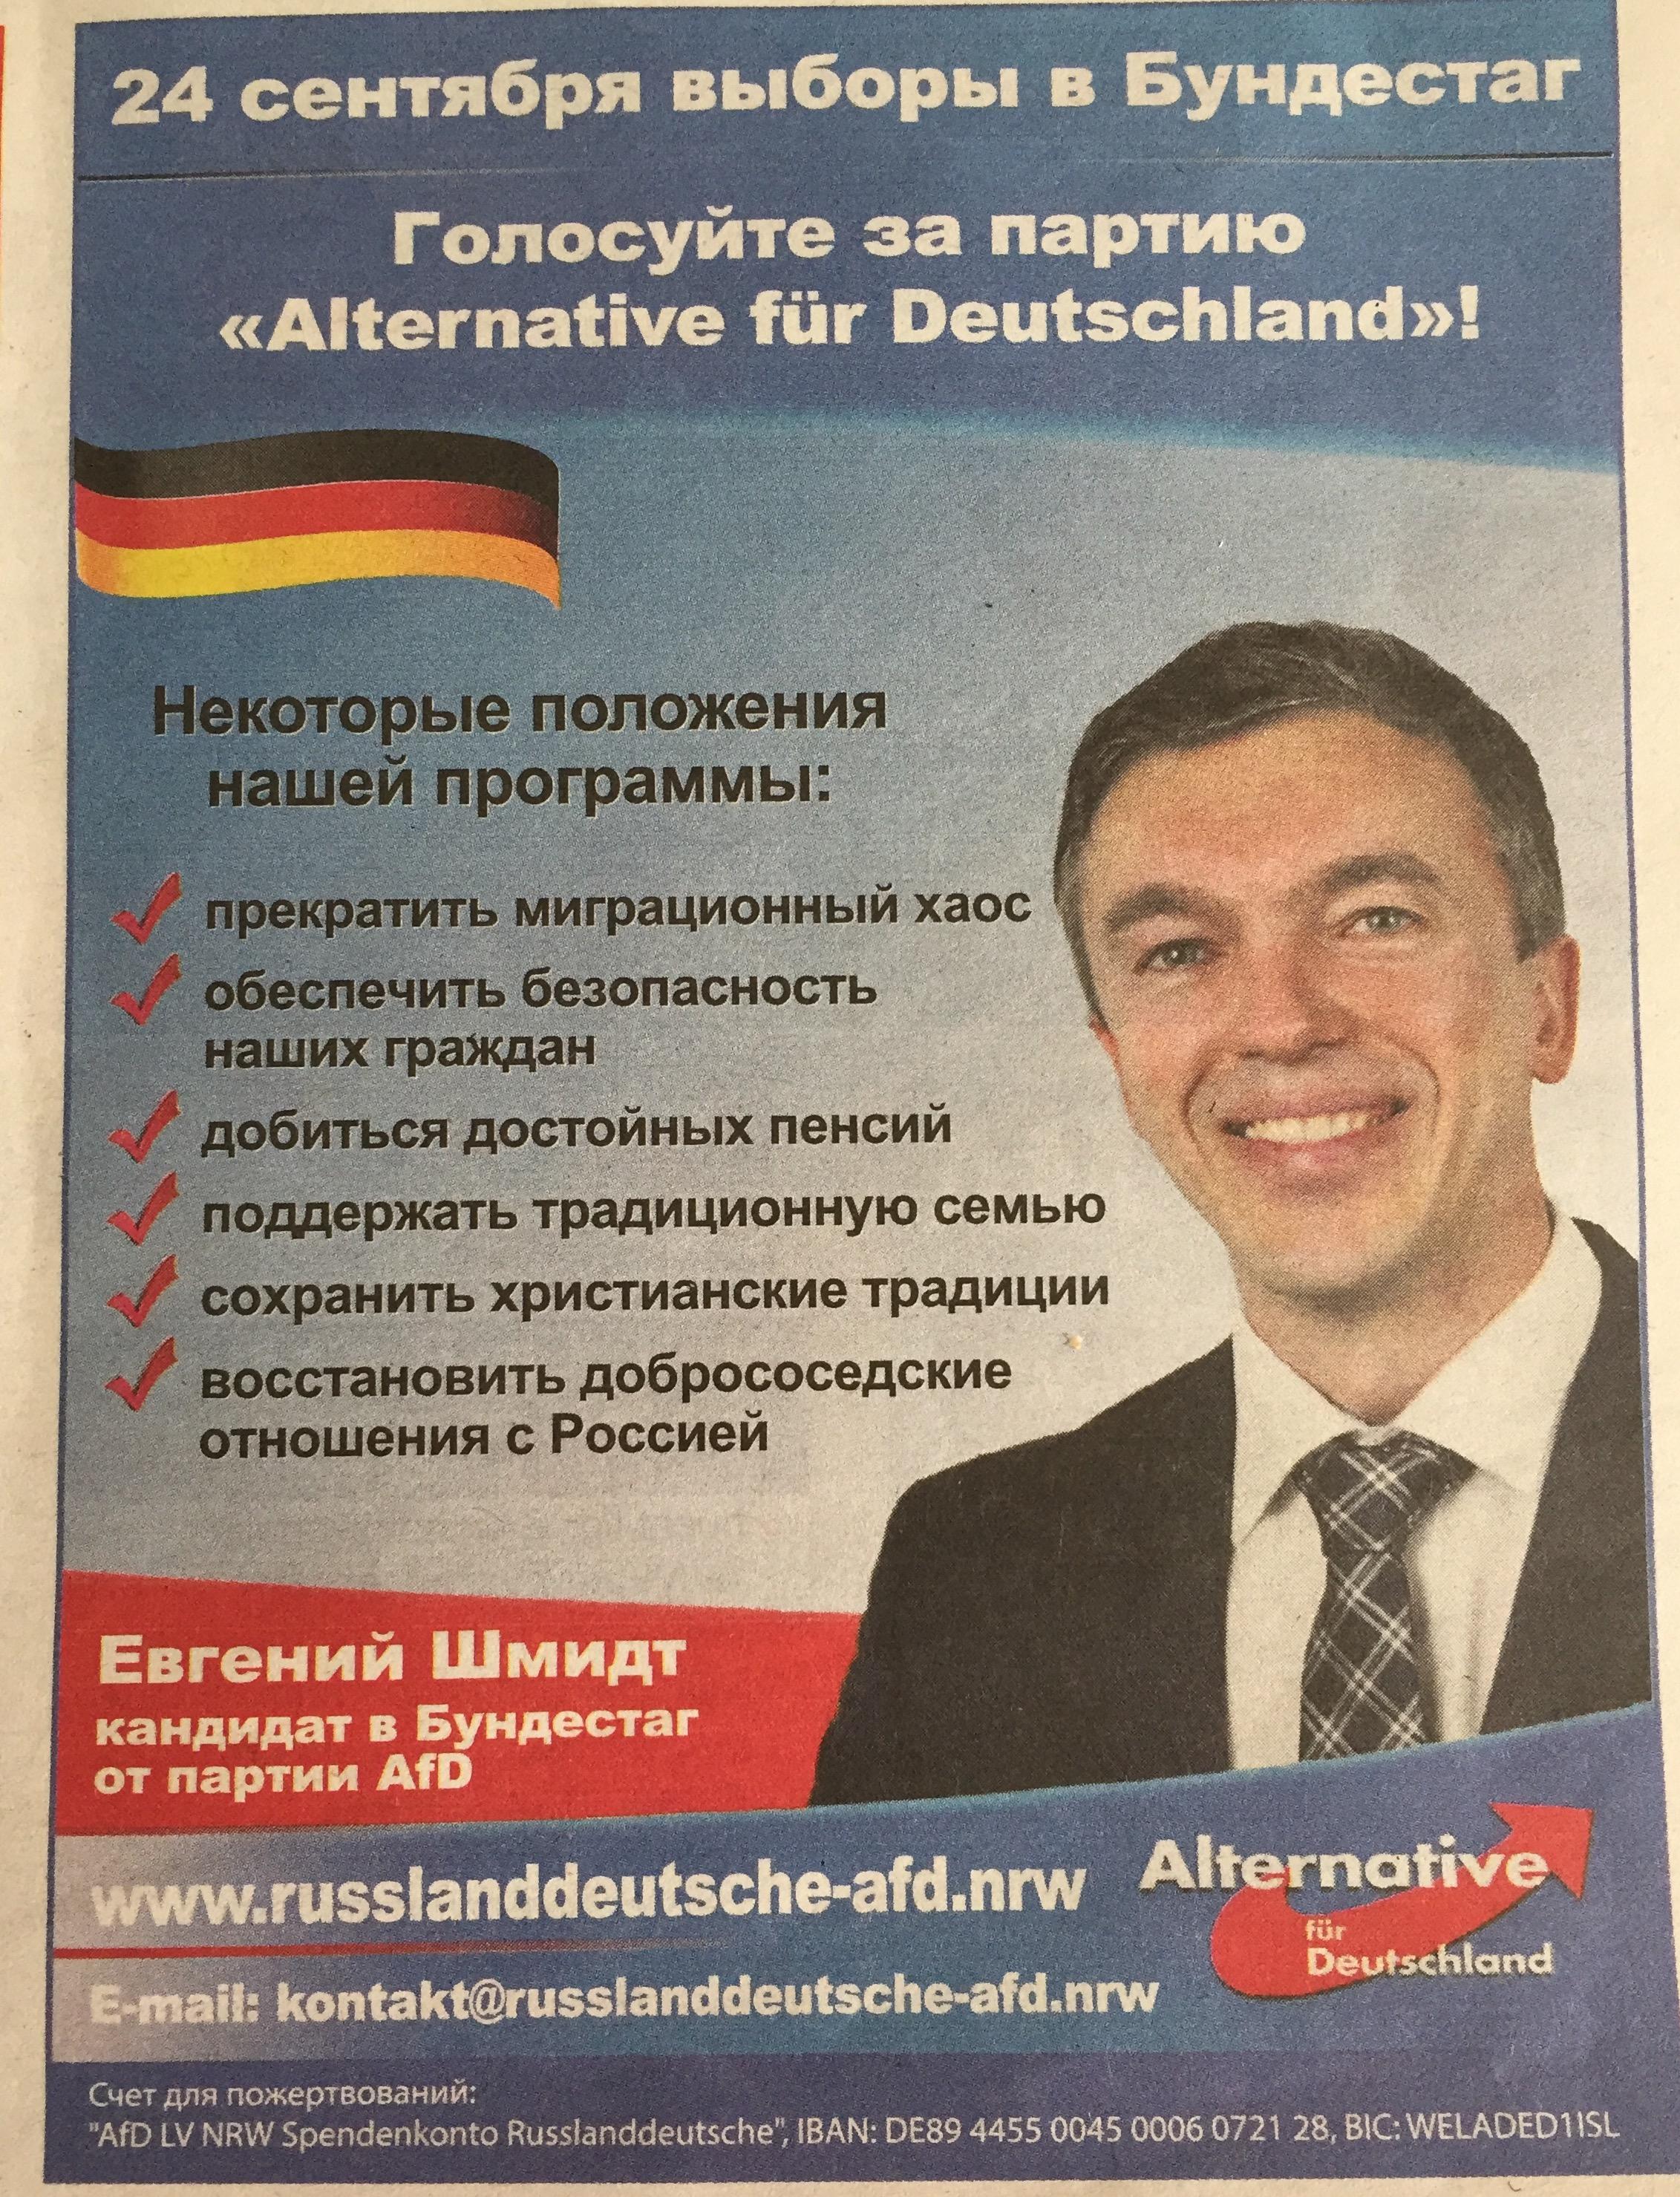 kscheib Telegraf Wahlwerbung AfD